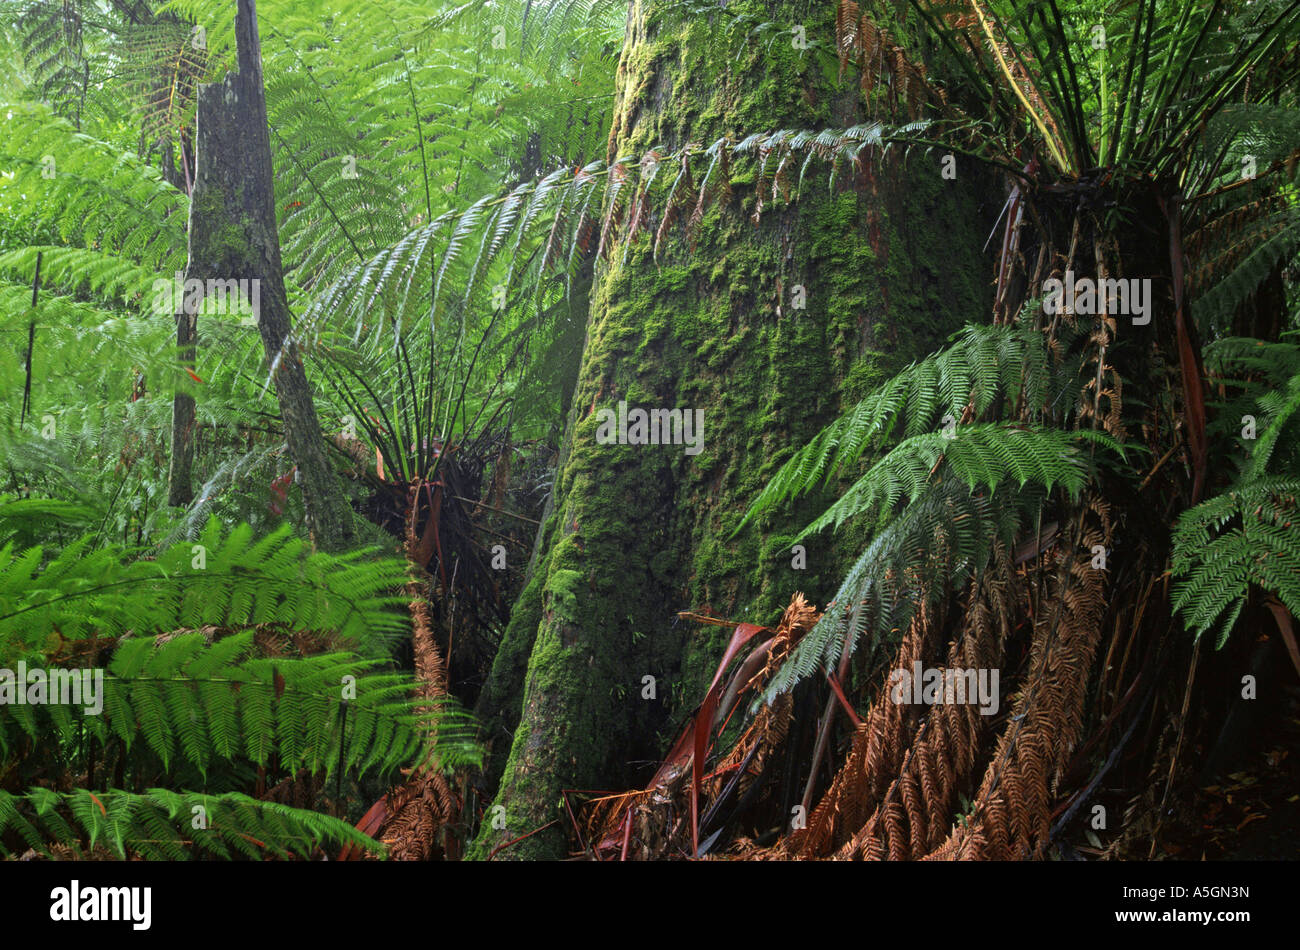 mountain ash, Victorian ash (Eucalyptus regnans), mossy tree trunk, world highest broadleaved tree, Australia, Tarra - Stock Image